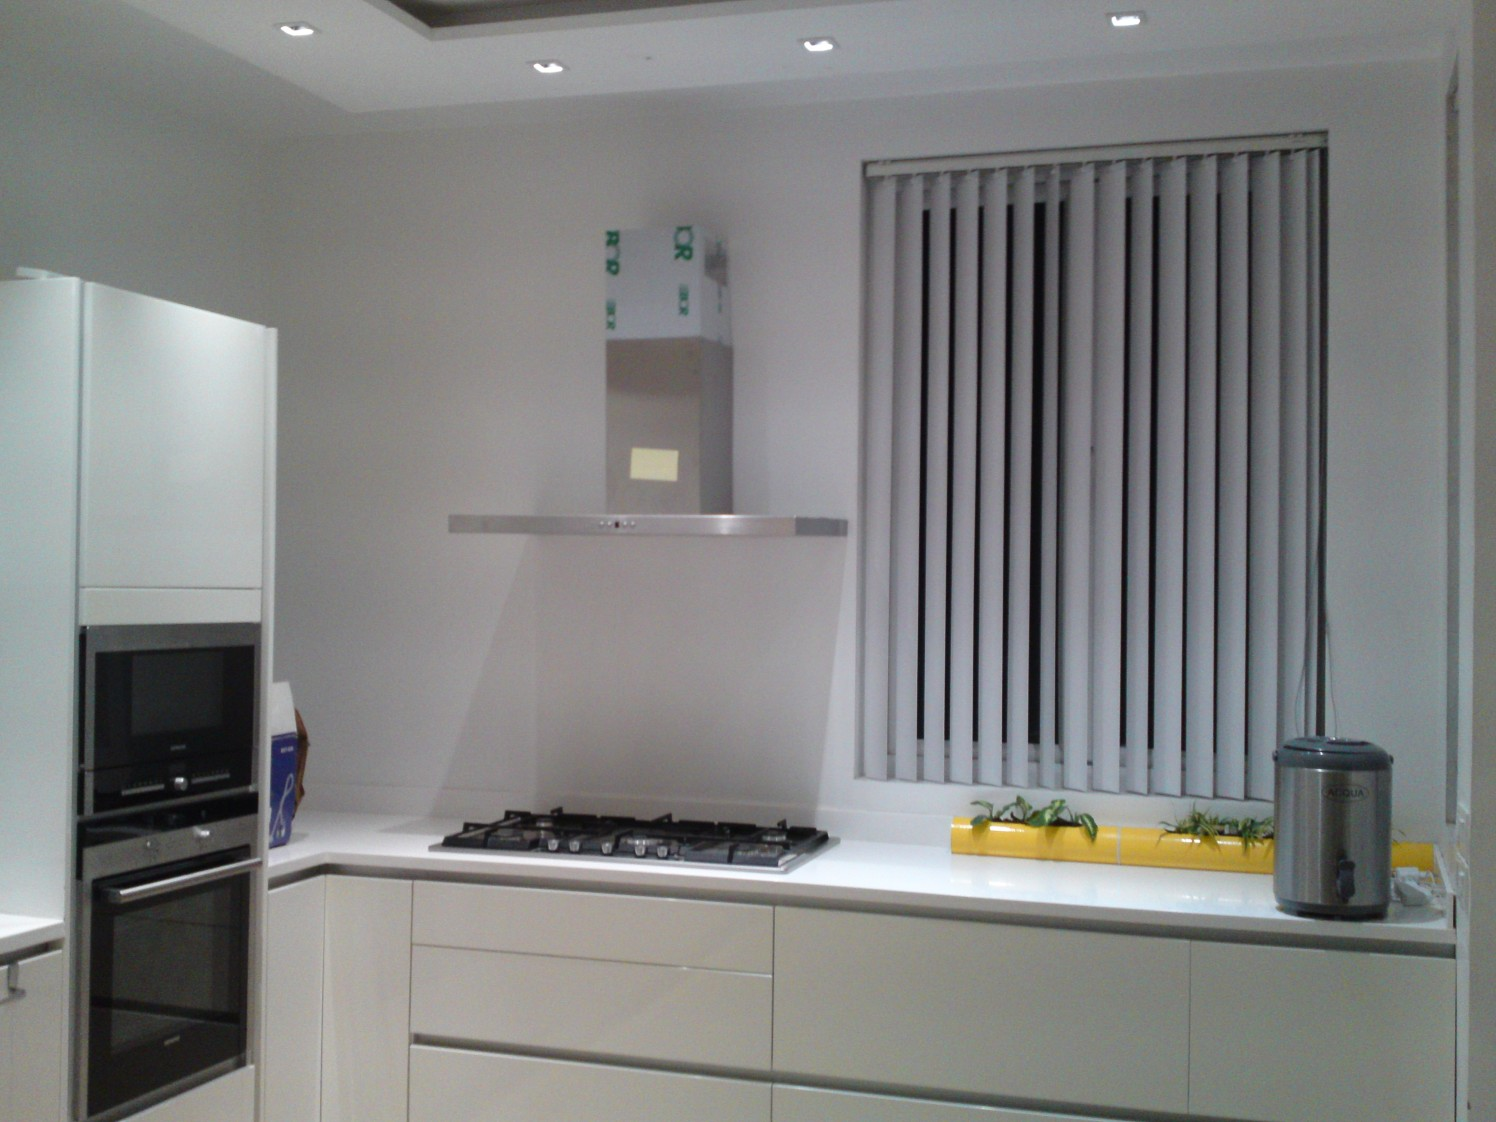 The Modular Kitchen by Deepti Srivastava